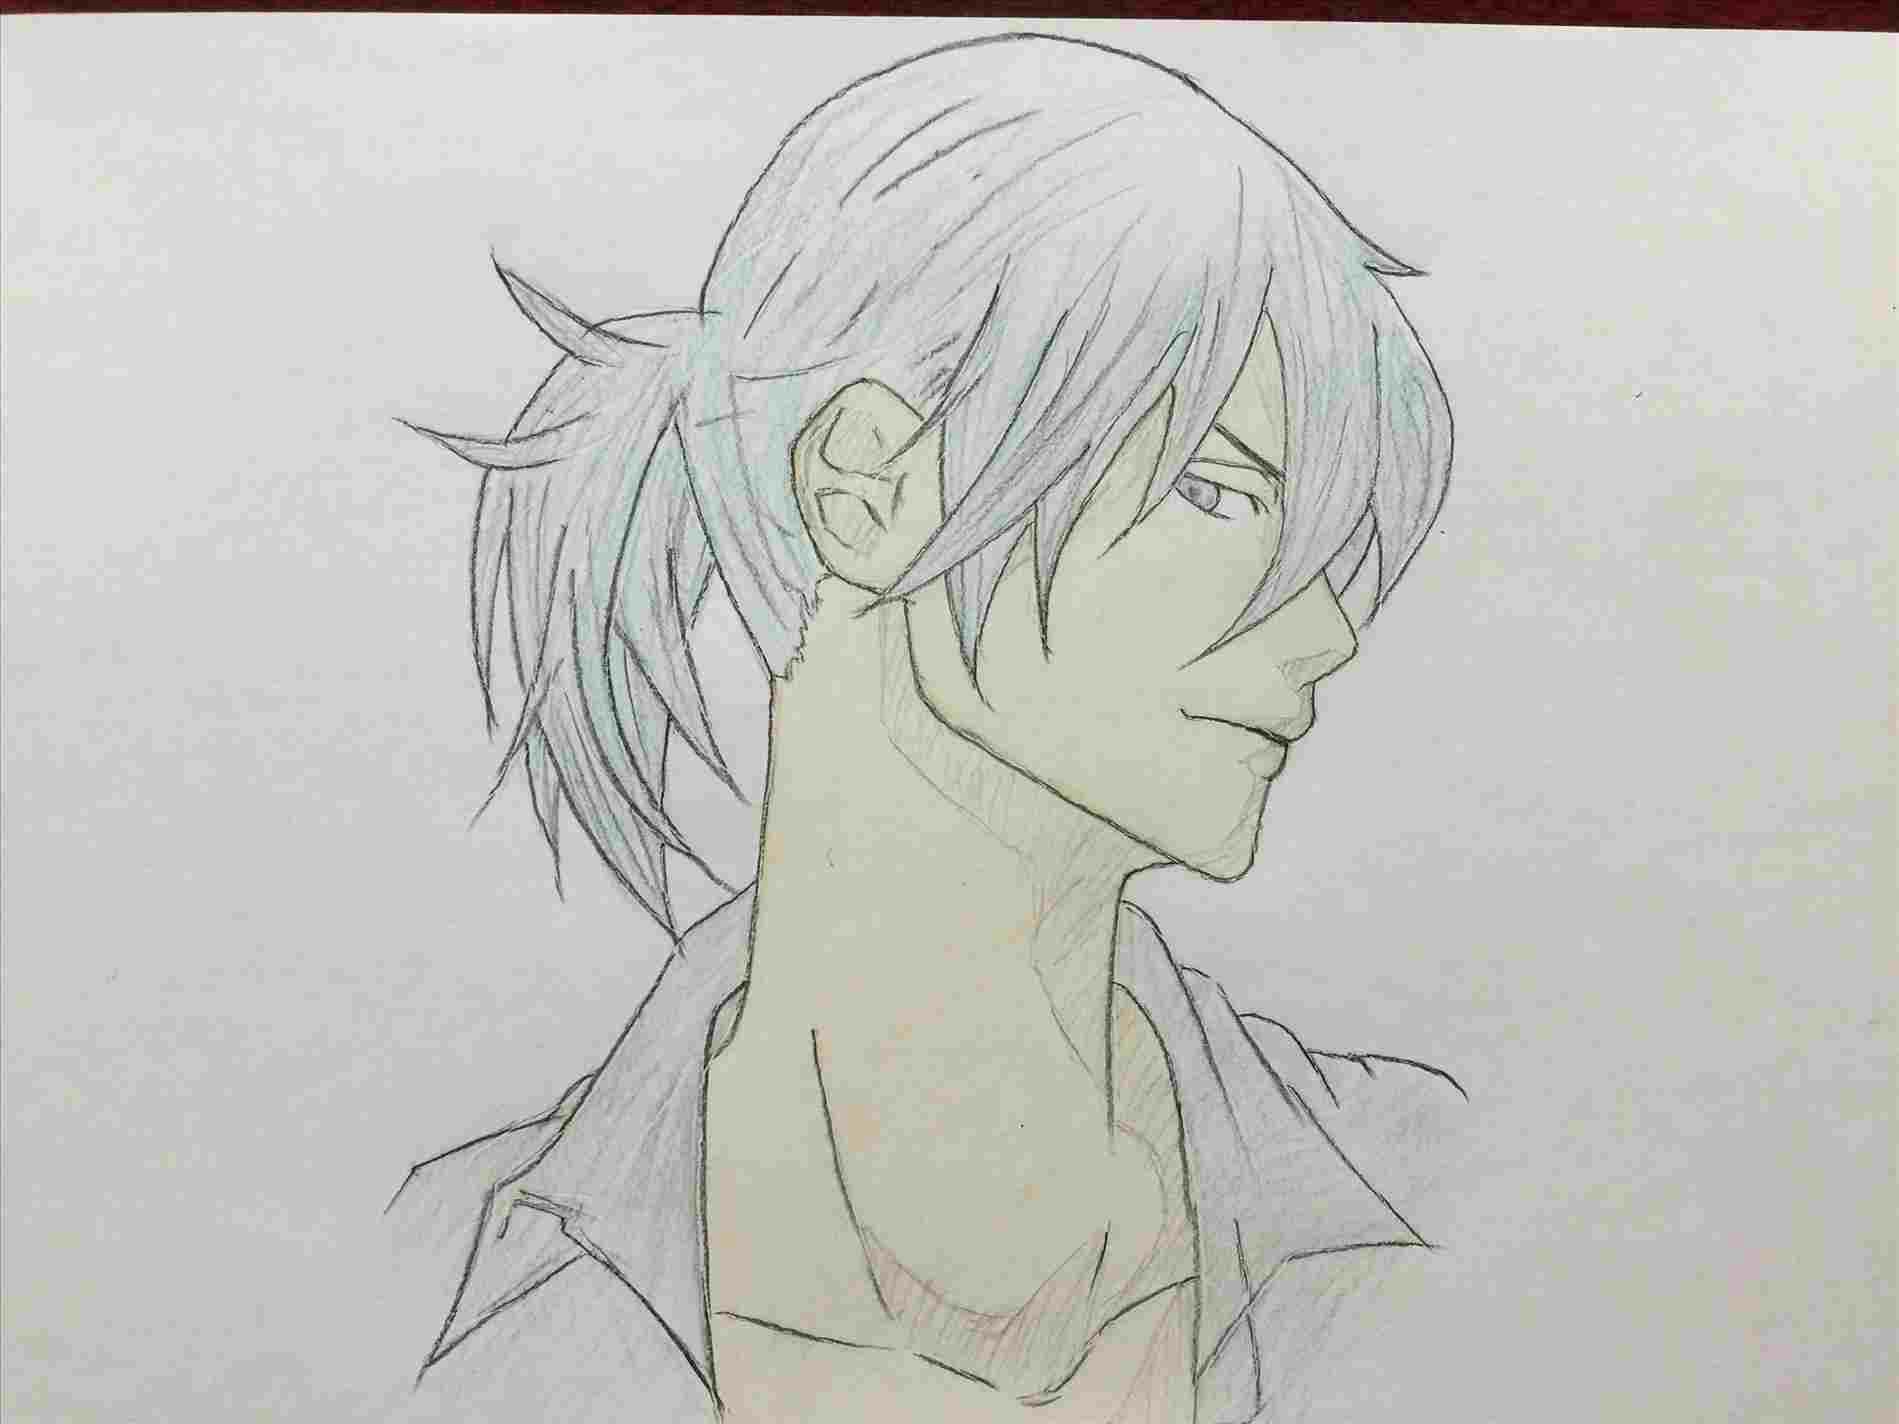 guy drawing od cute male anime men black hair green eyes tie school uniform rhpinterestcom how to draw a chibi boy with pictures wikihowrhwikihowcom how jpg